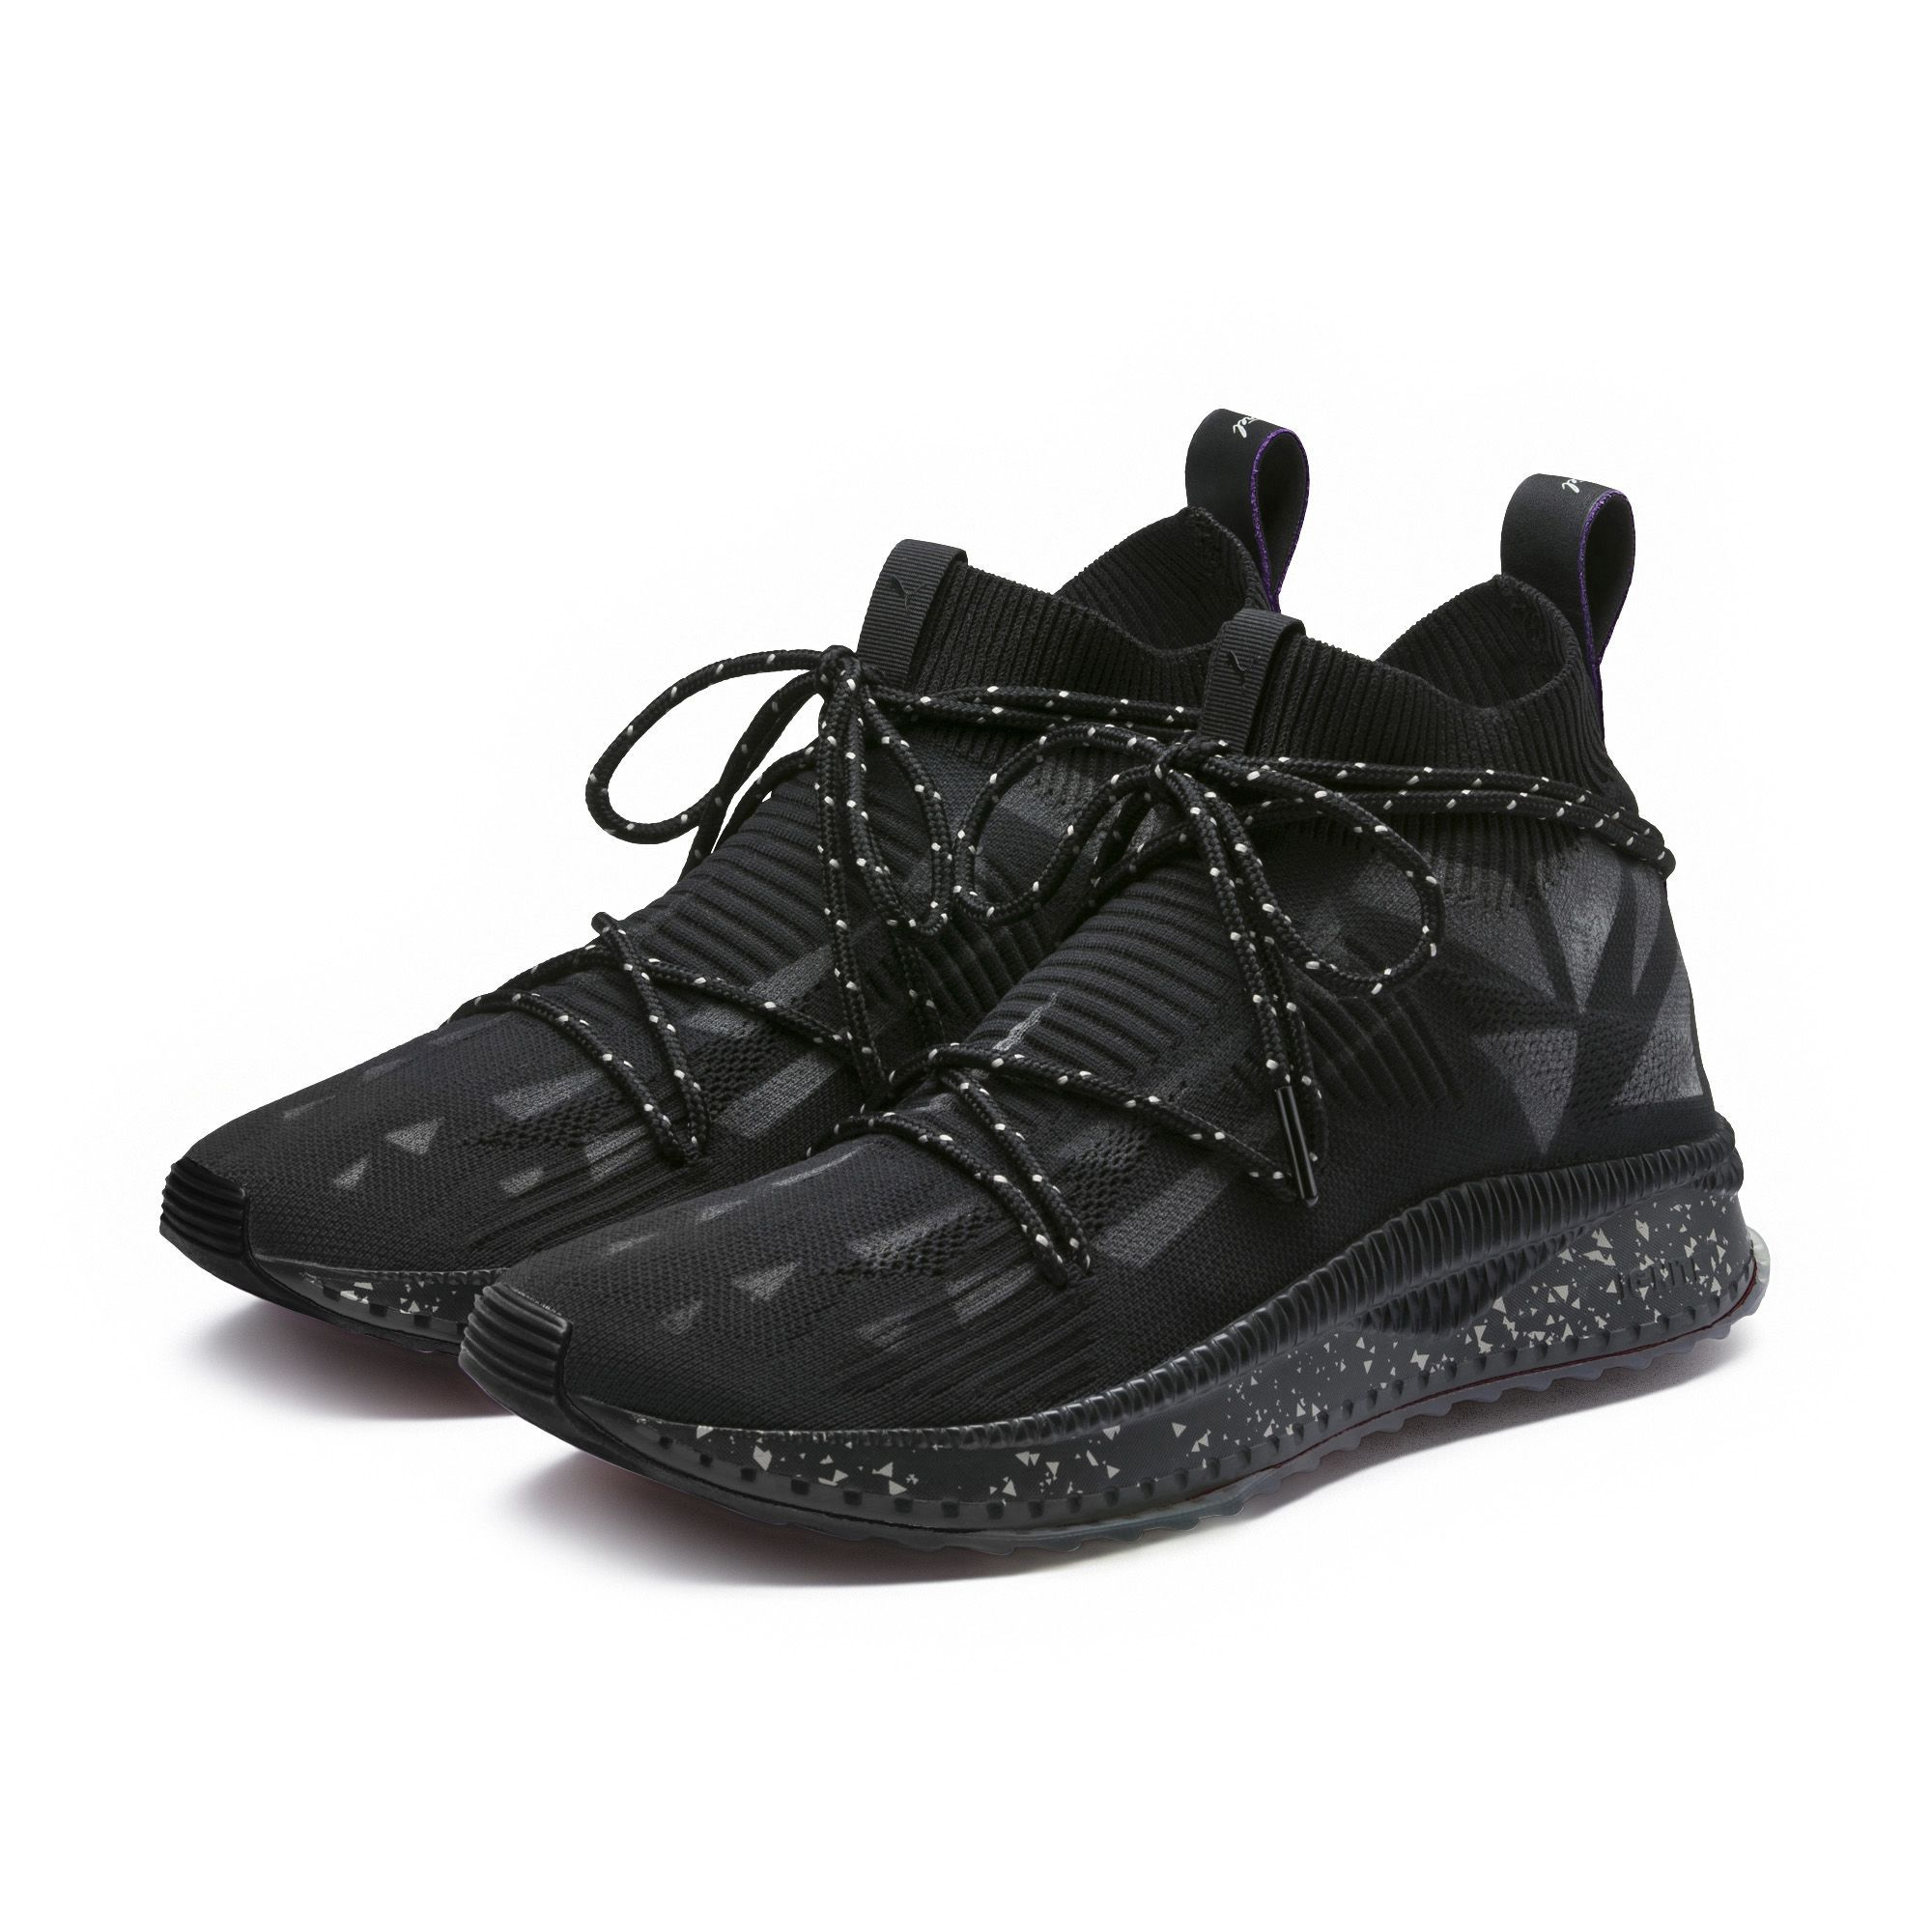 PUMA x NATUREL TSUGI evoKNIT Sock Sneakers | Sneakers